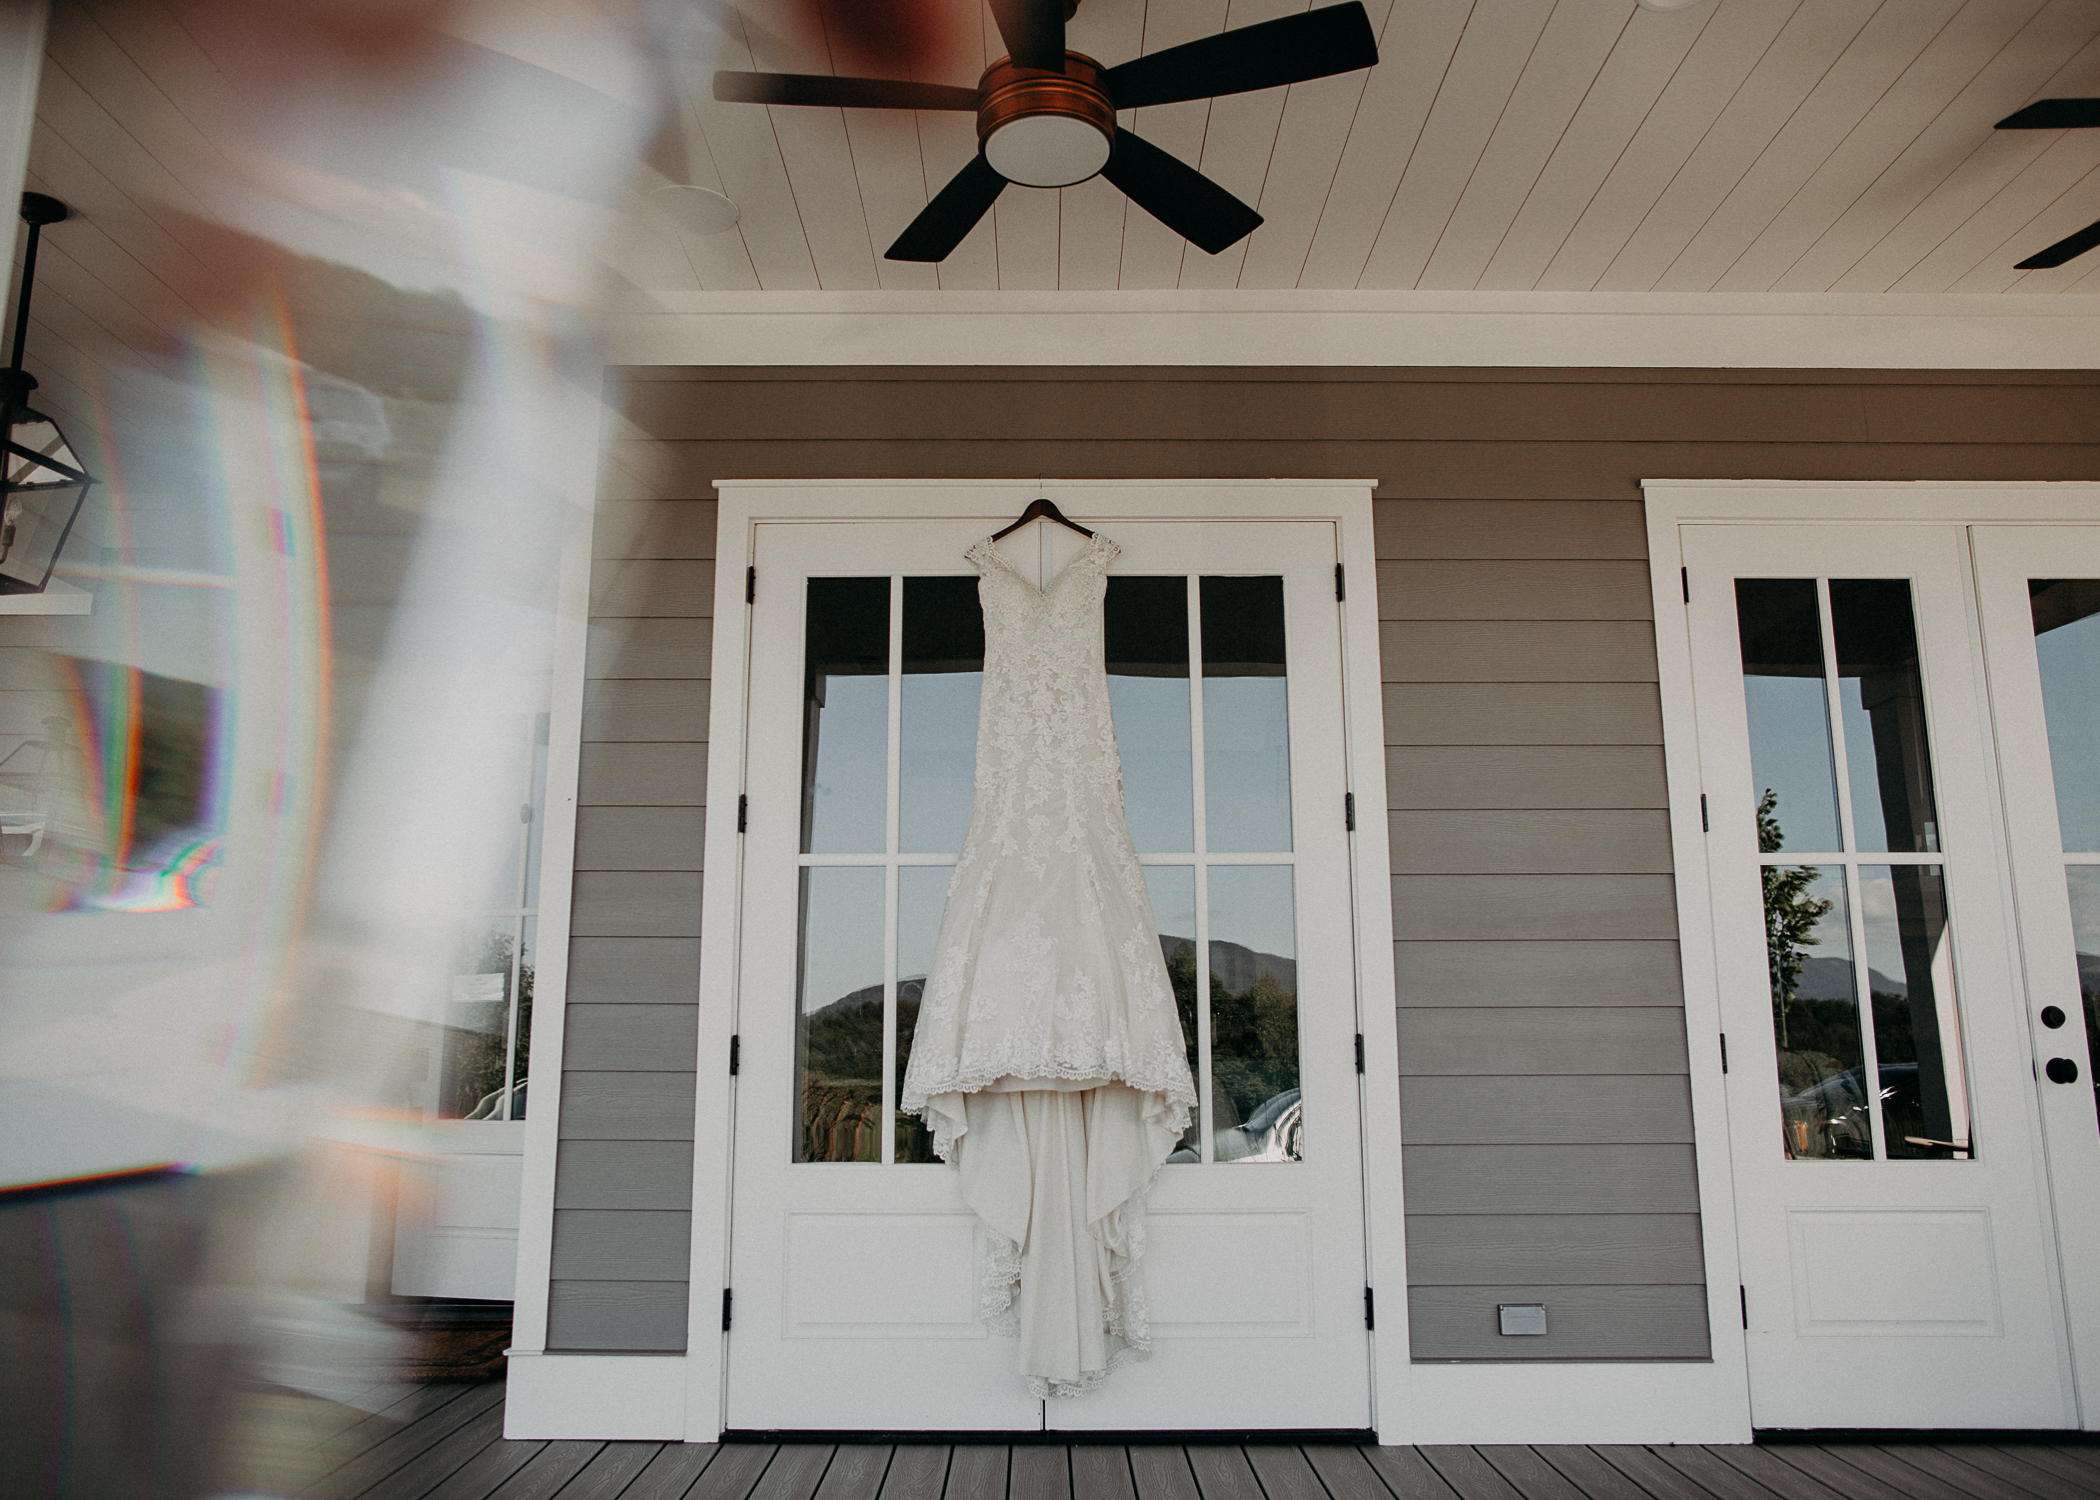 1- Wedding_day_atlanta_georgia_bridal_dress_aline_marin_photography_wedding_photographer-1.jpg